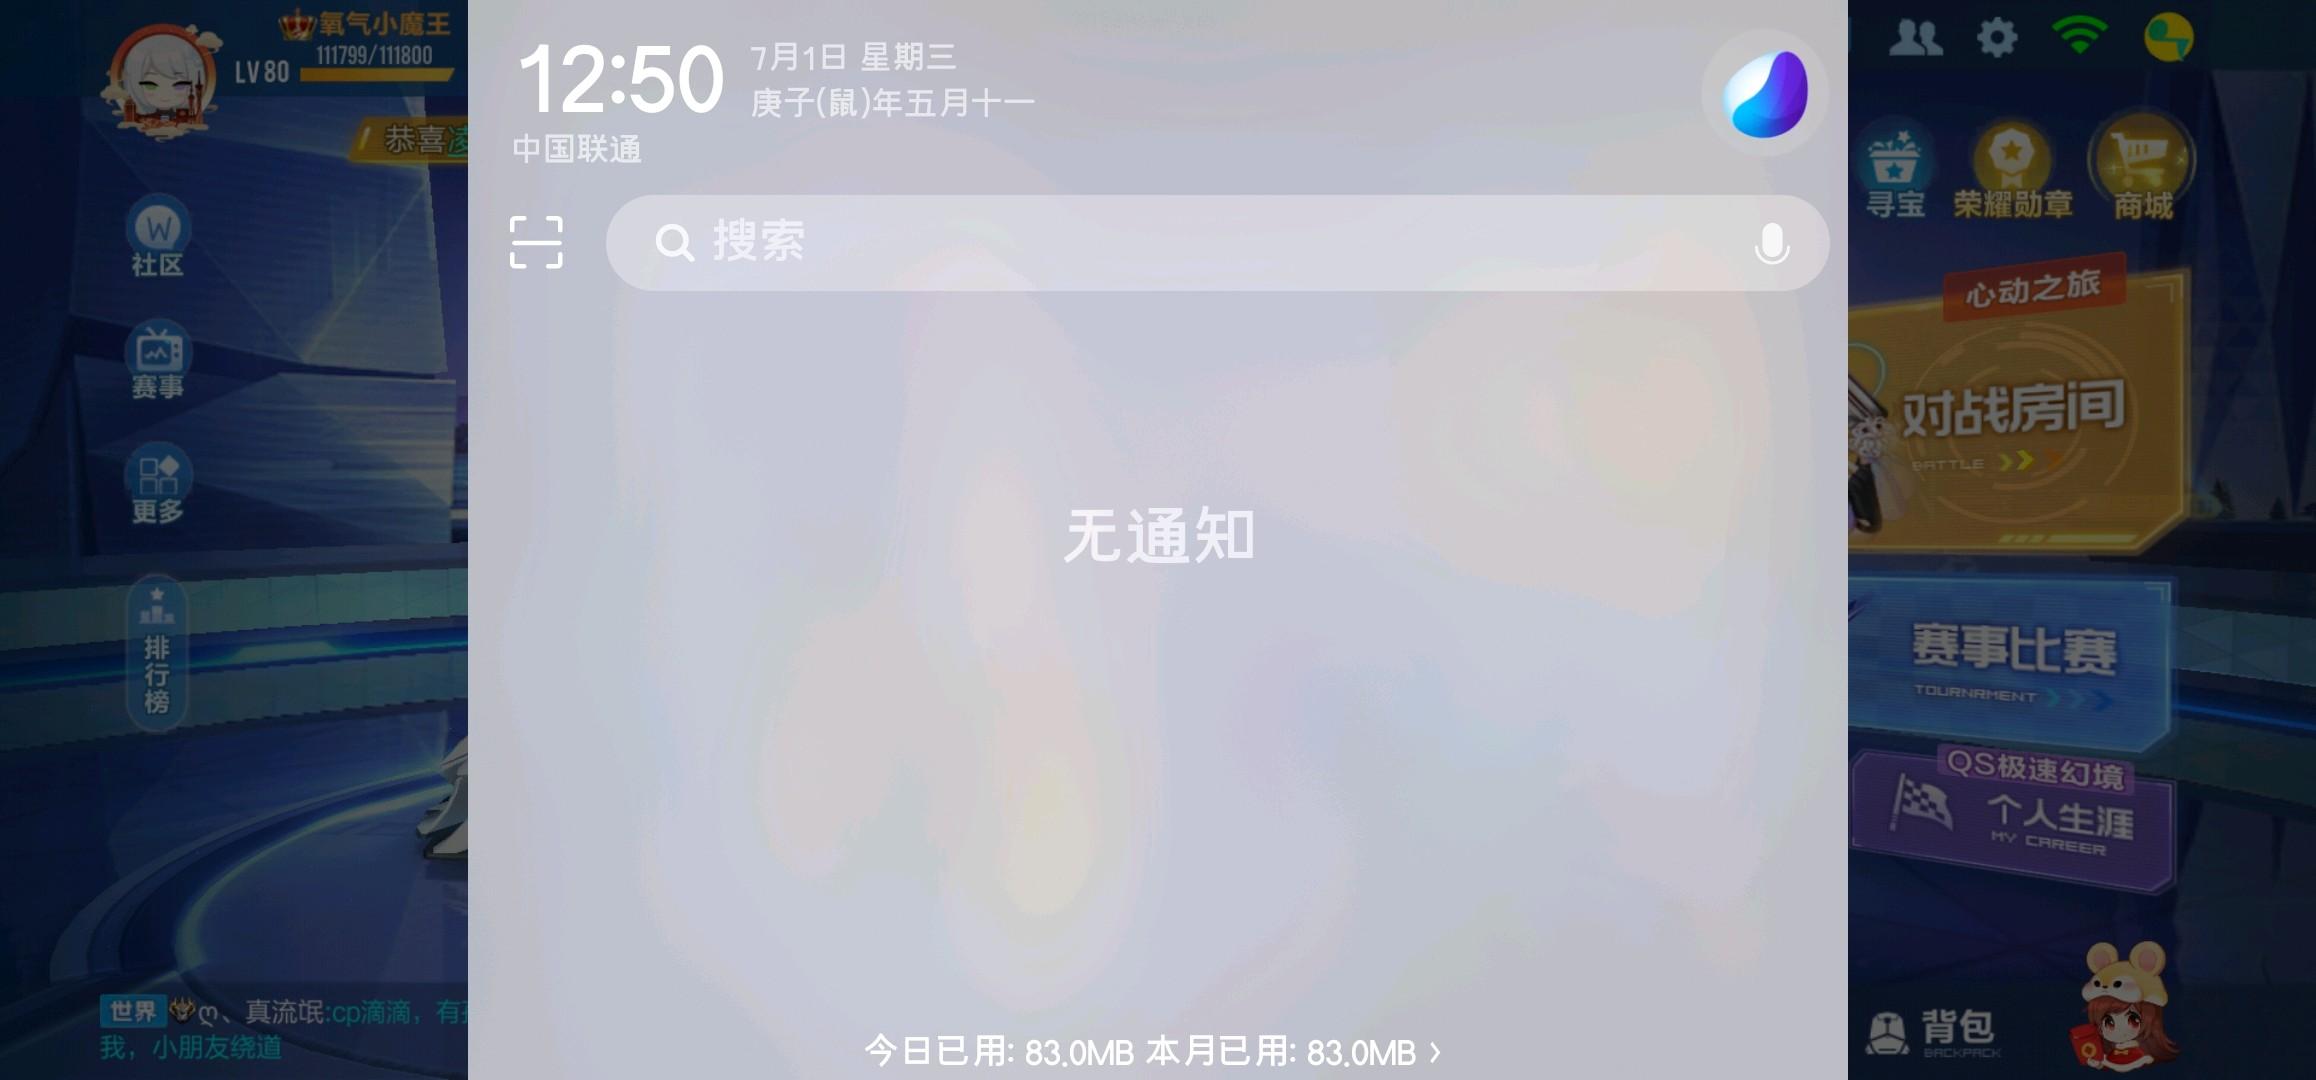 Screenshot_20200701_125025_1bf8dfeae7baf1ef15f833c5ea4c02c2.jpg